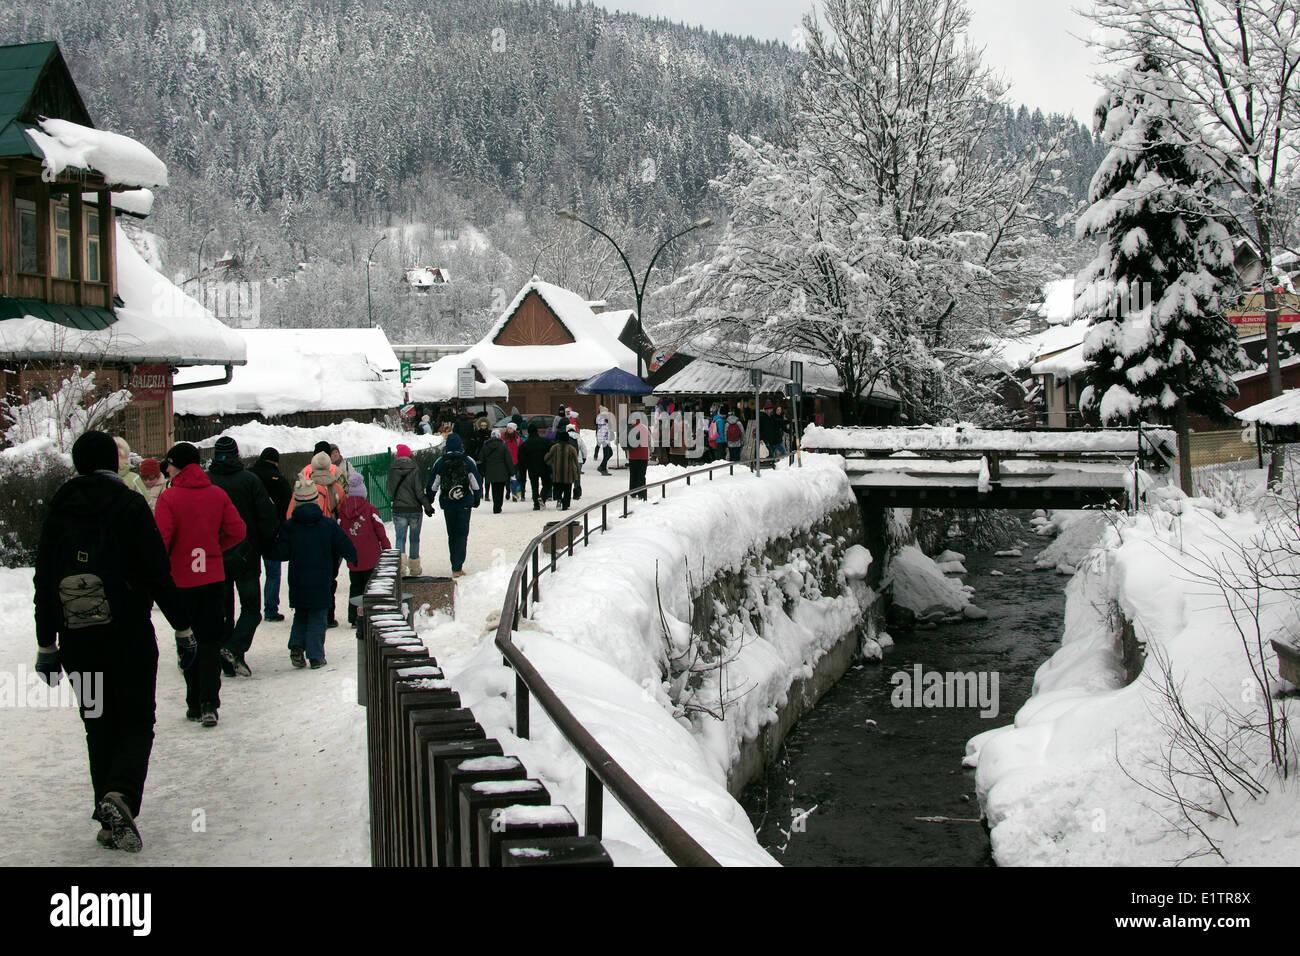 Europe, Poland, Malopolska province, Zakopane city, - Stock Image